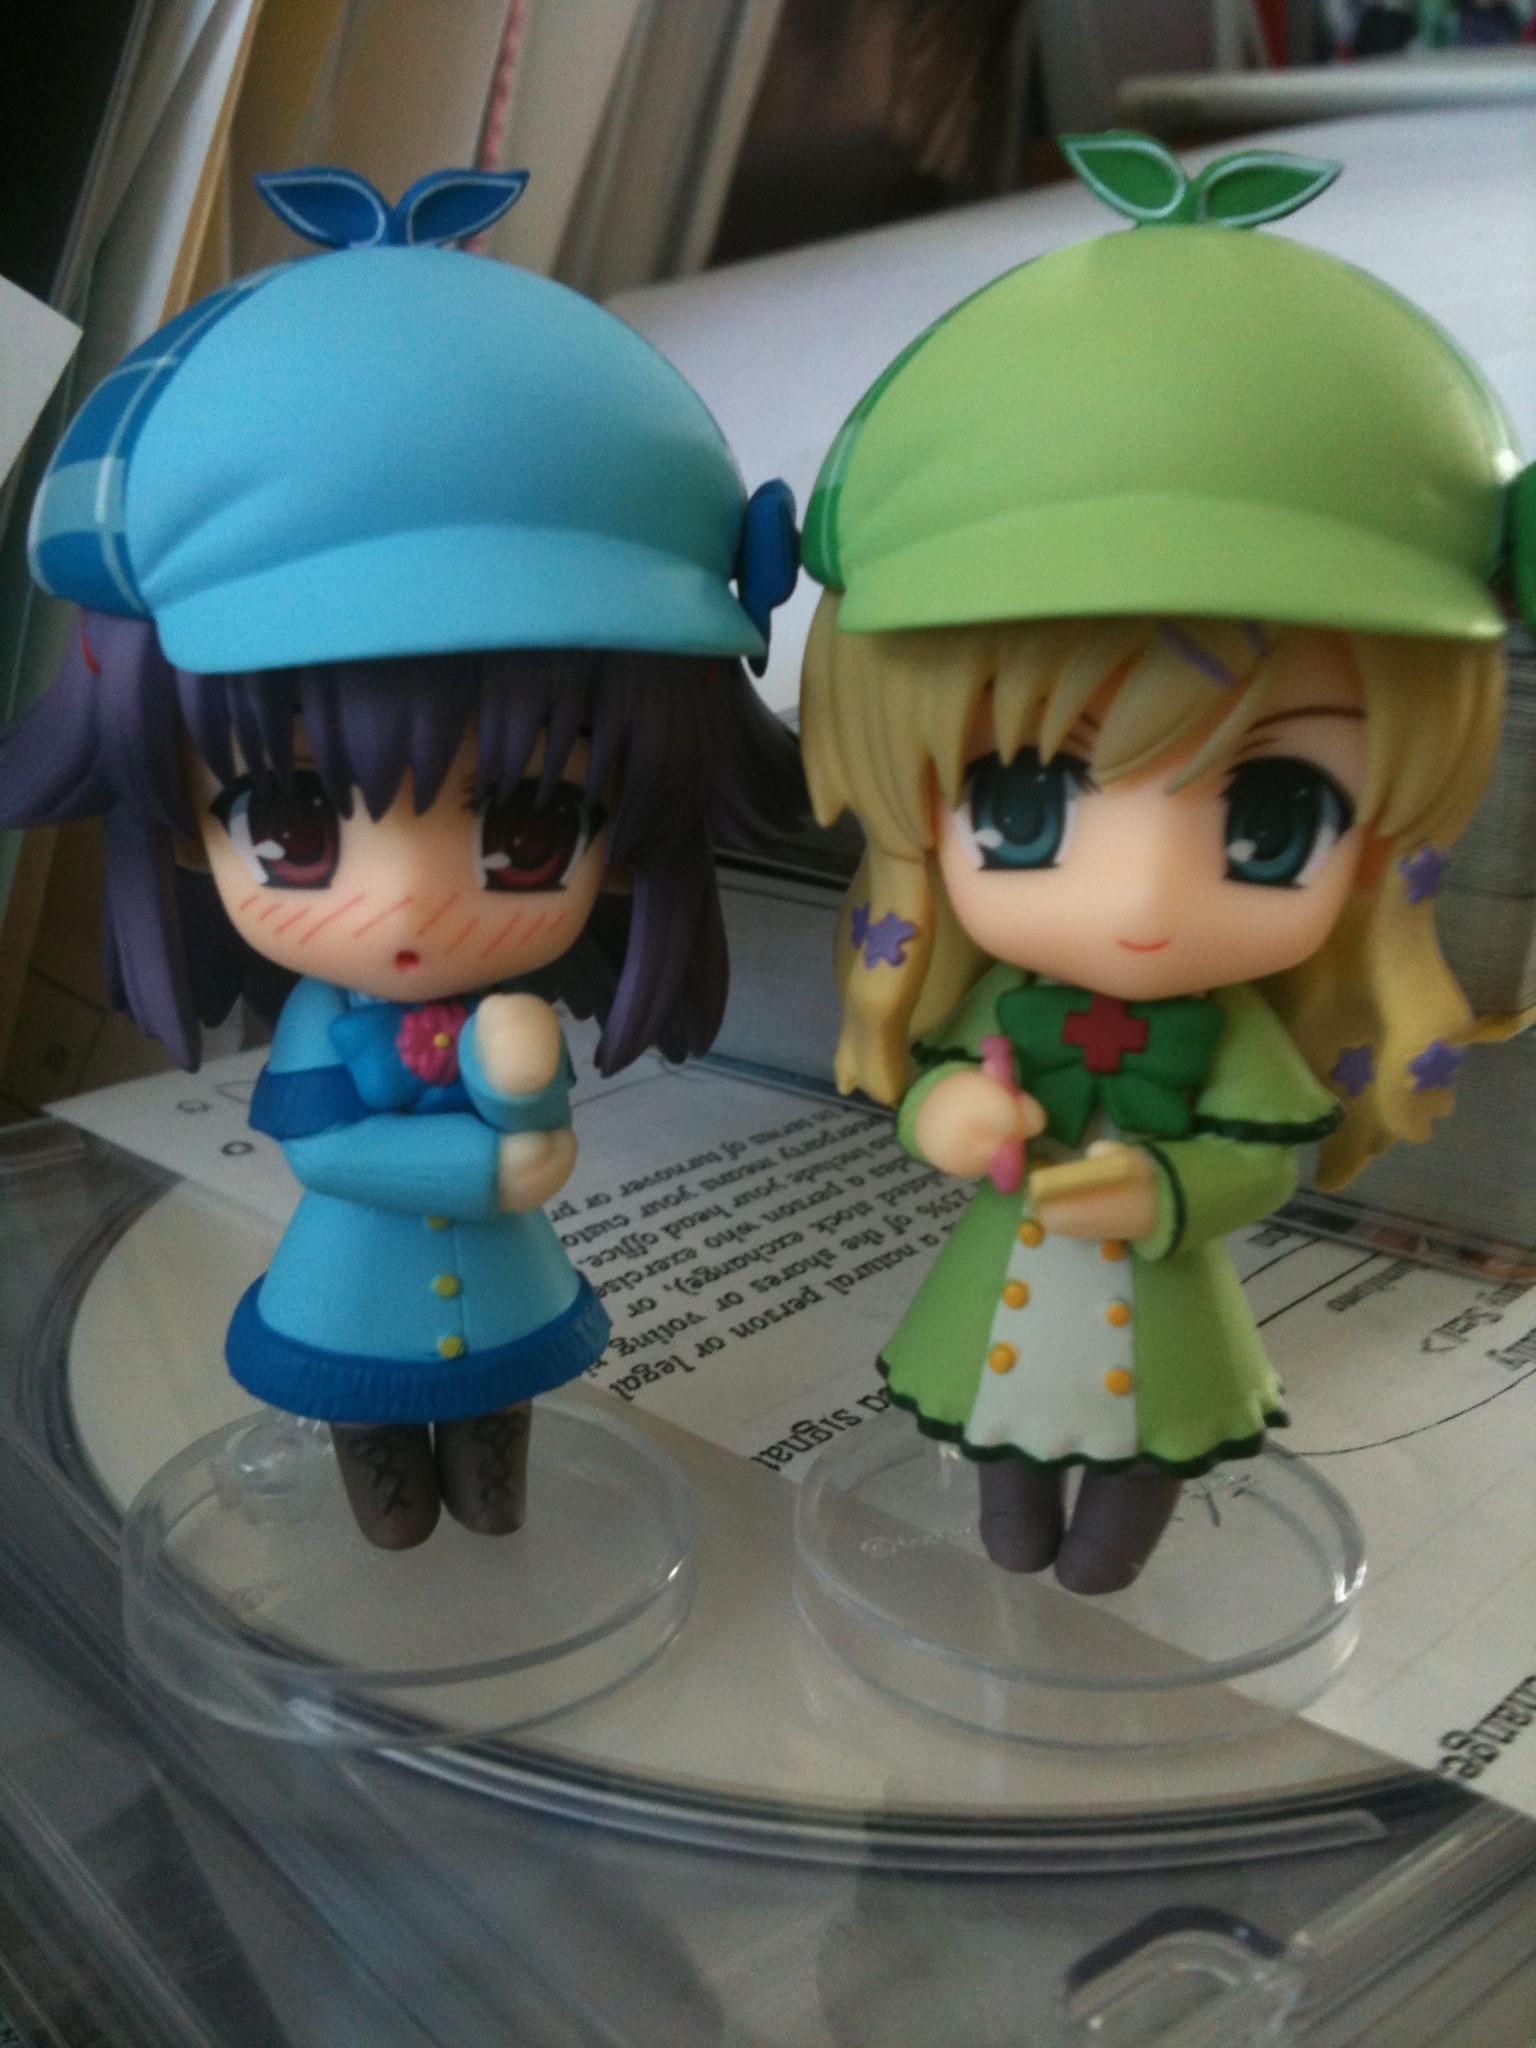 Nendoroid Petit Elly and Cordelia